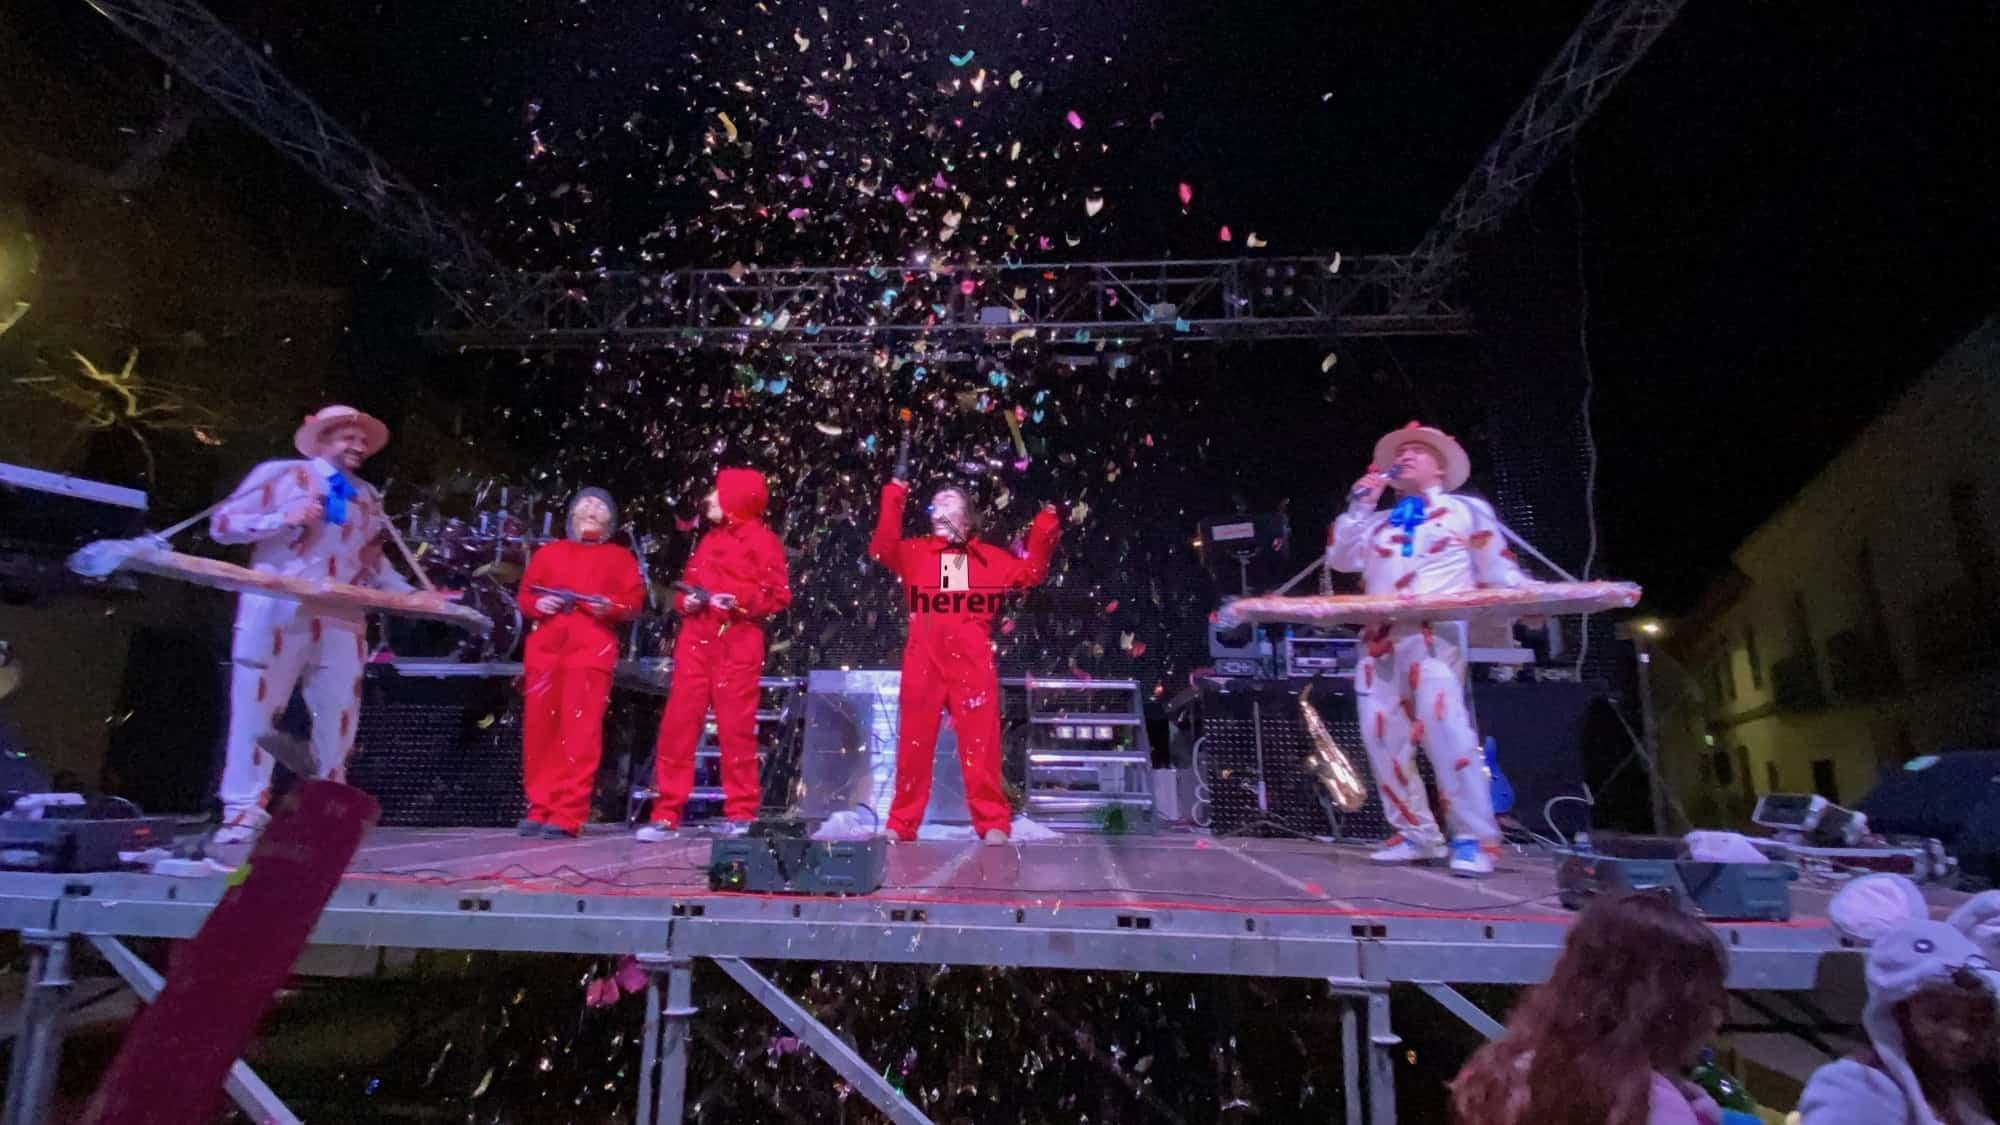 Carnaval de herencia 2019 sabados ansiosos 8 - Inaugurado el Carnaval de Herencia 2020 con el Sábado de los Ansiosos